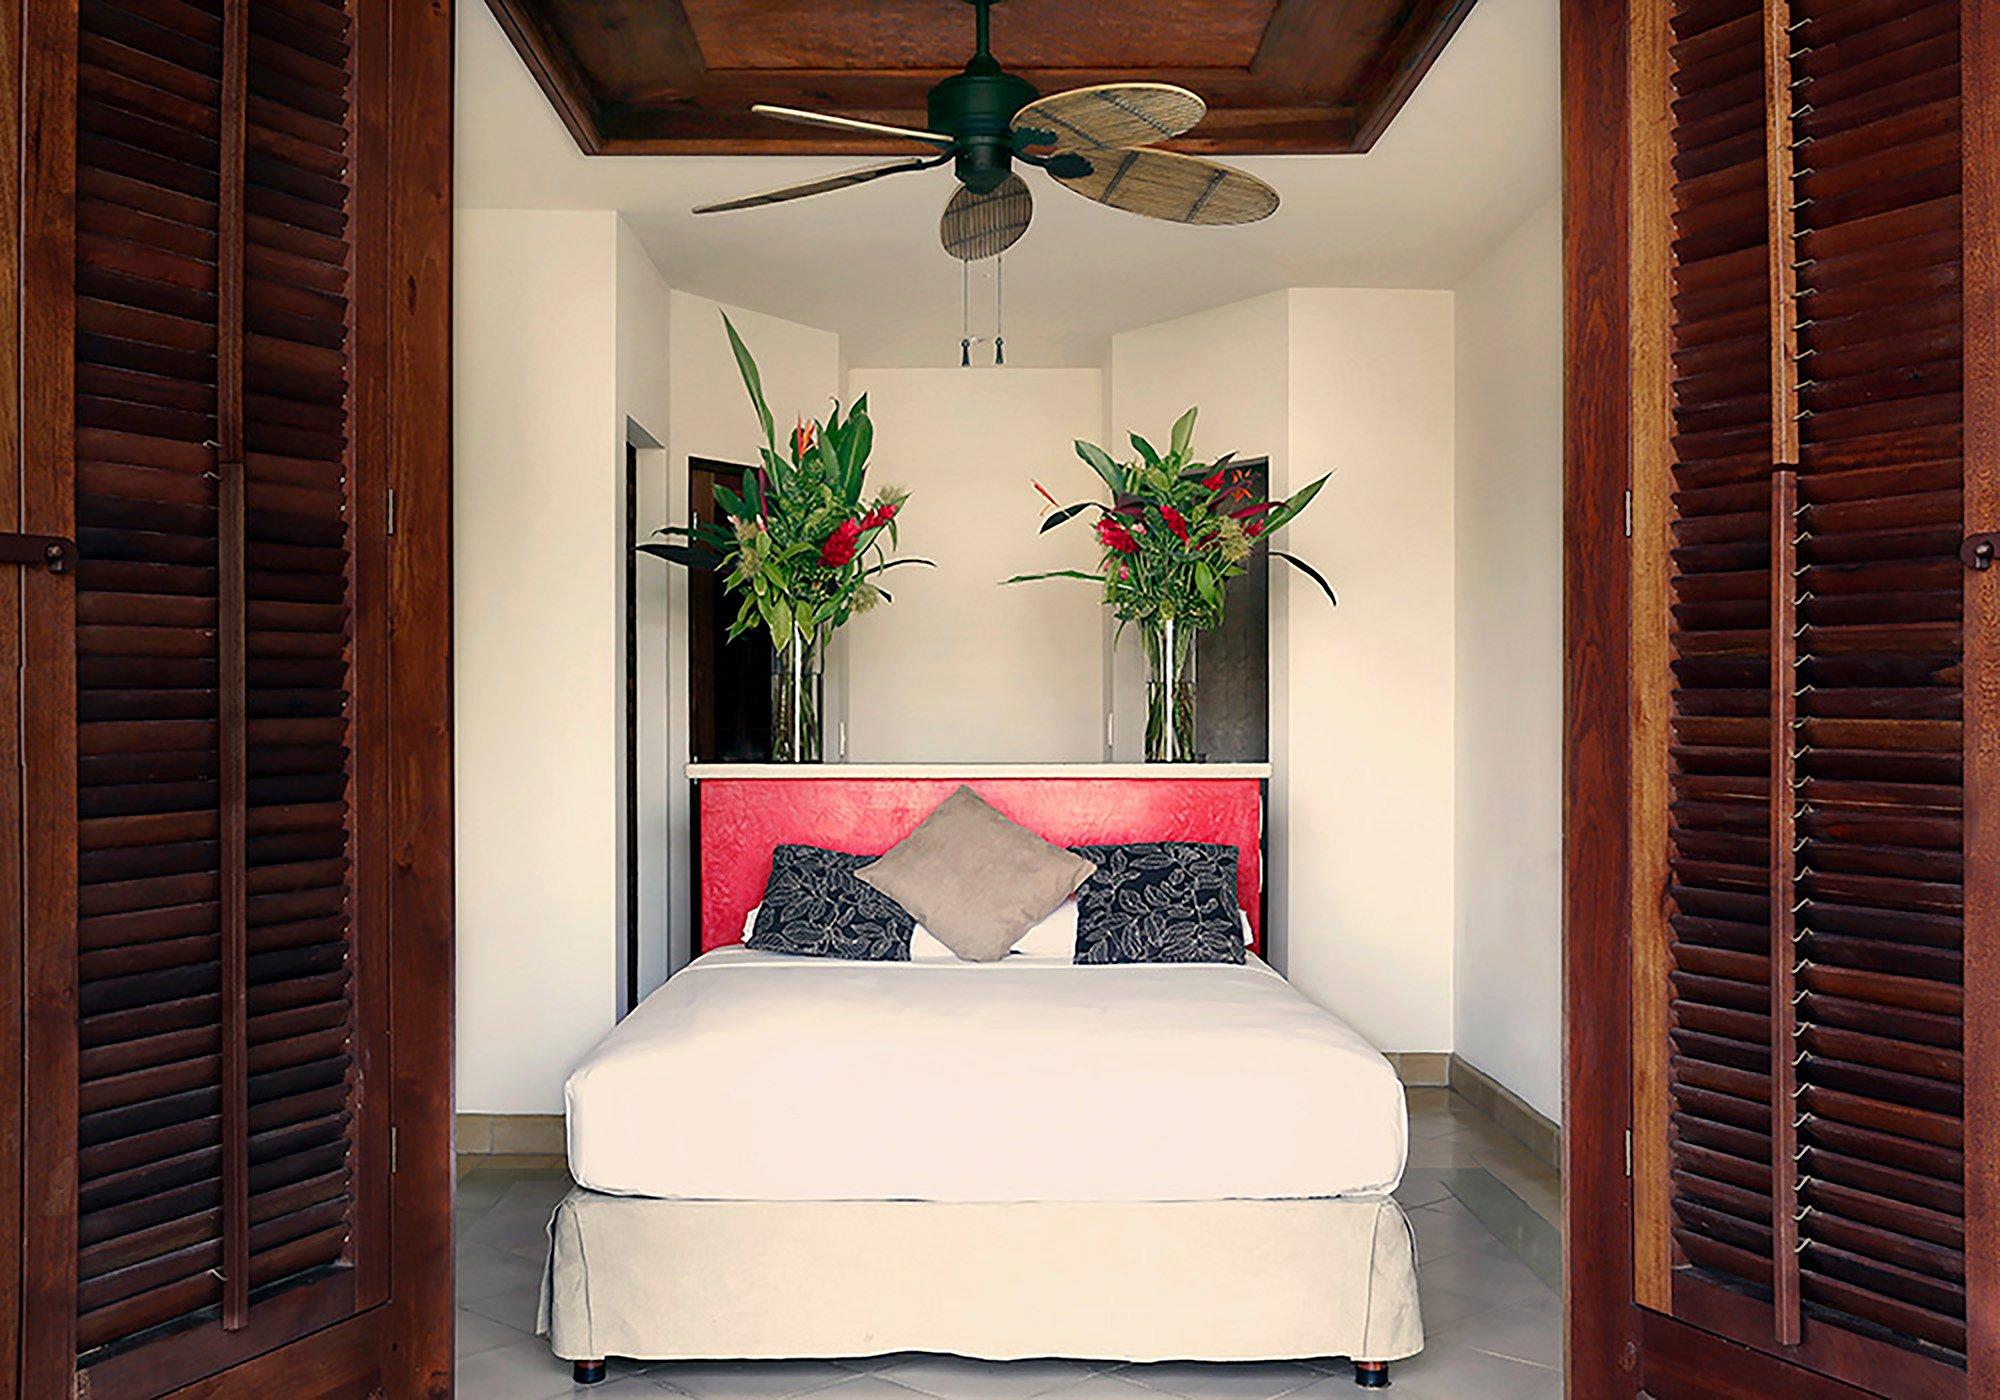 Hermitage Suite Room